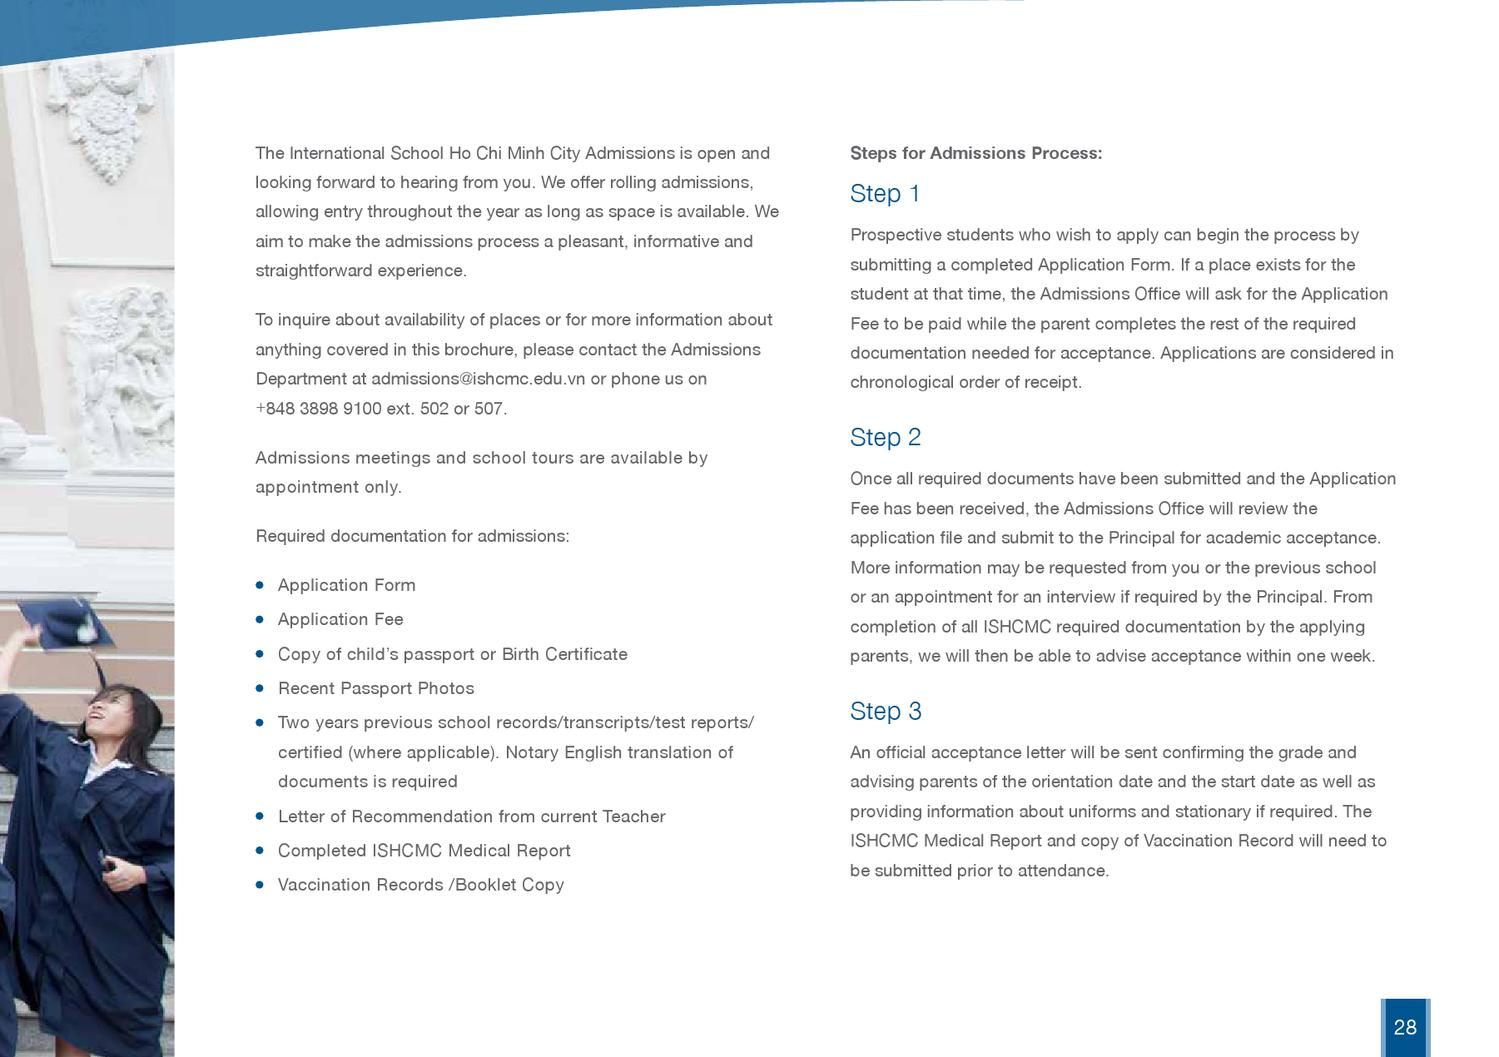 ISHCMC Prospectus 2013